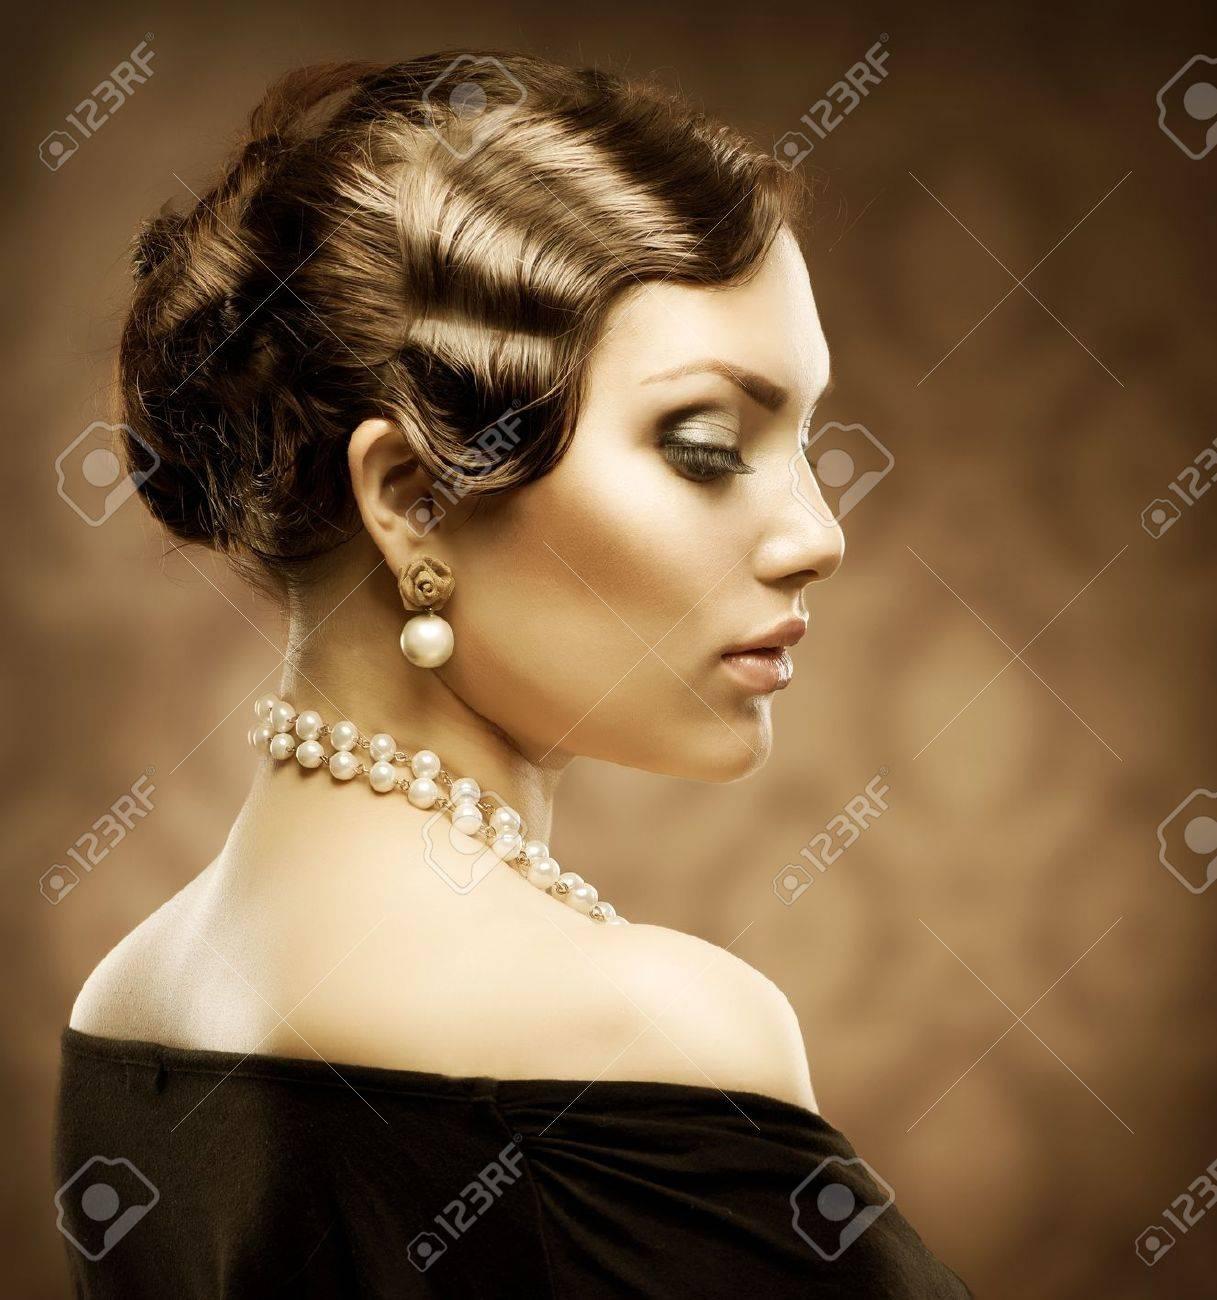 Sepia Toned Retro Style Portrait Romantic Beauty Stock Photo ...